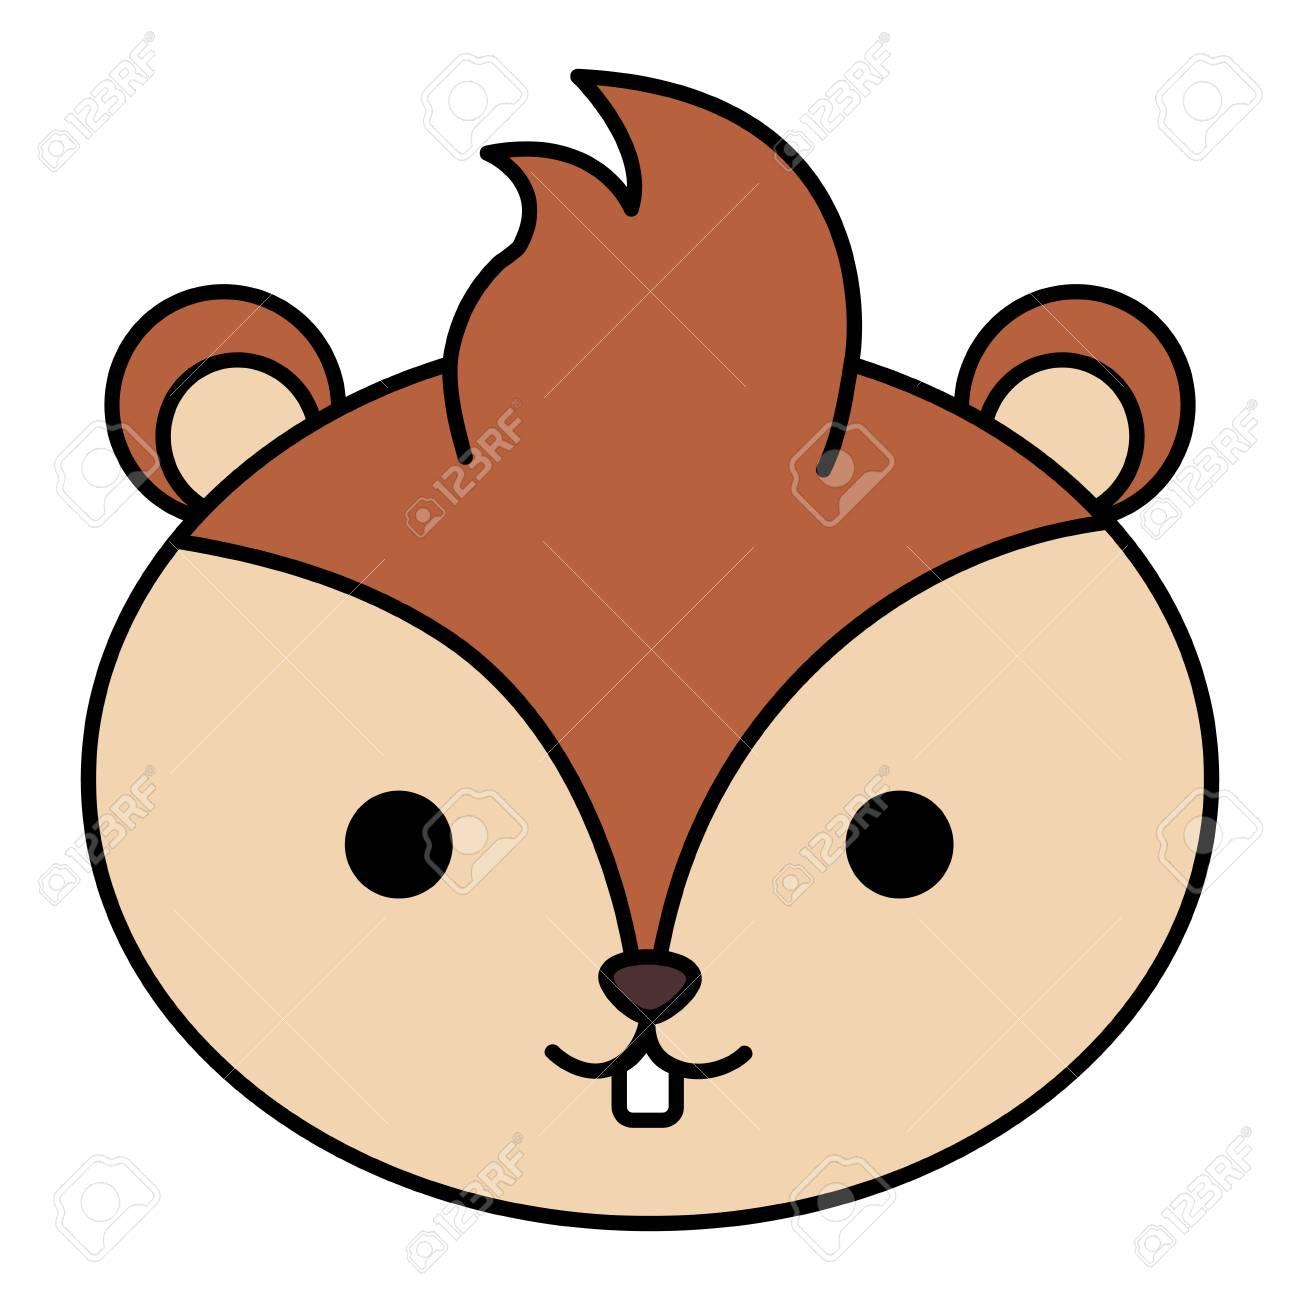 cute and tender chipmunk head vector illustration design.